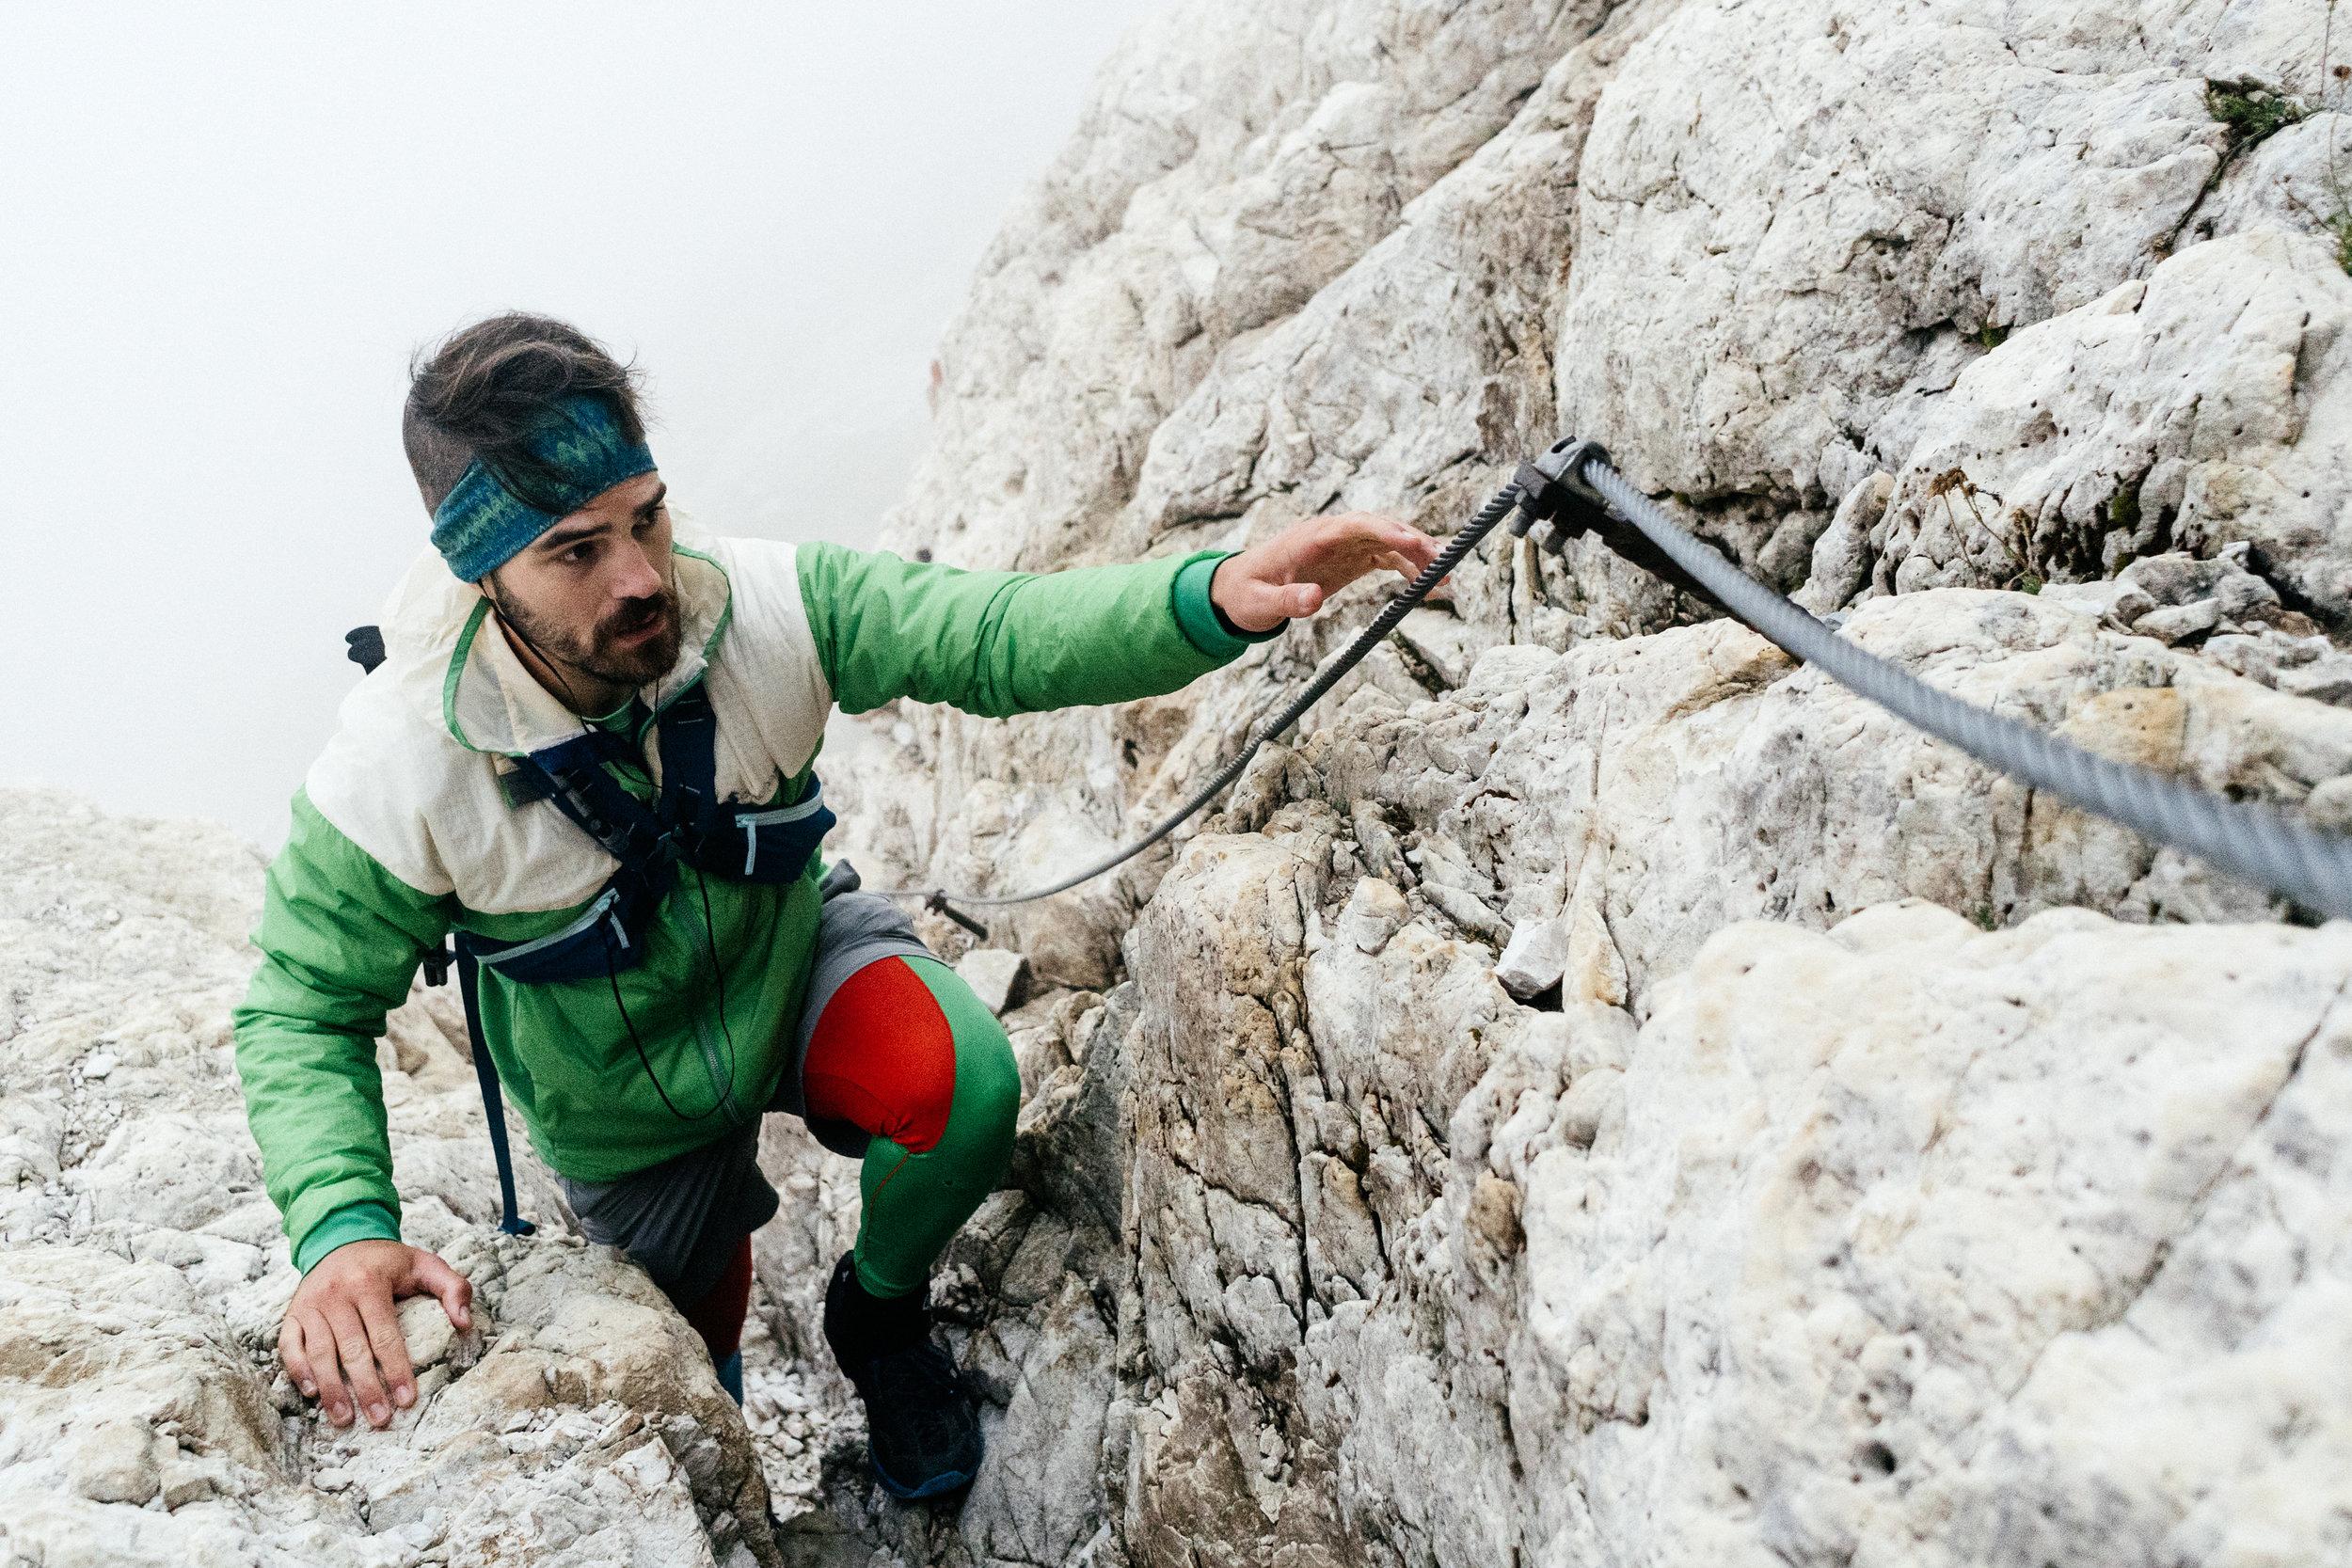 Dolomites-ChrisBrinleeJr-SEP17-66.jpg